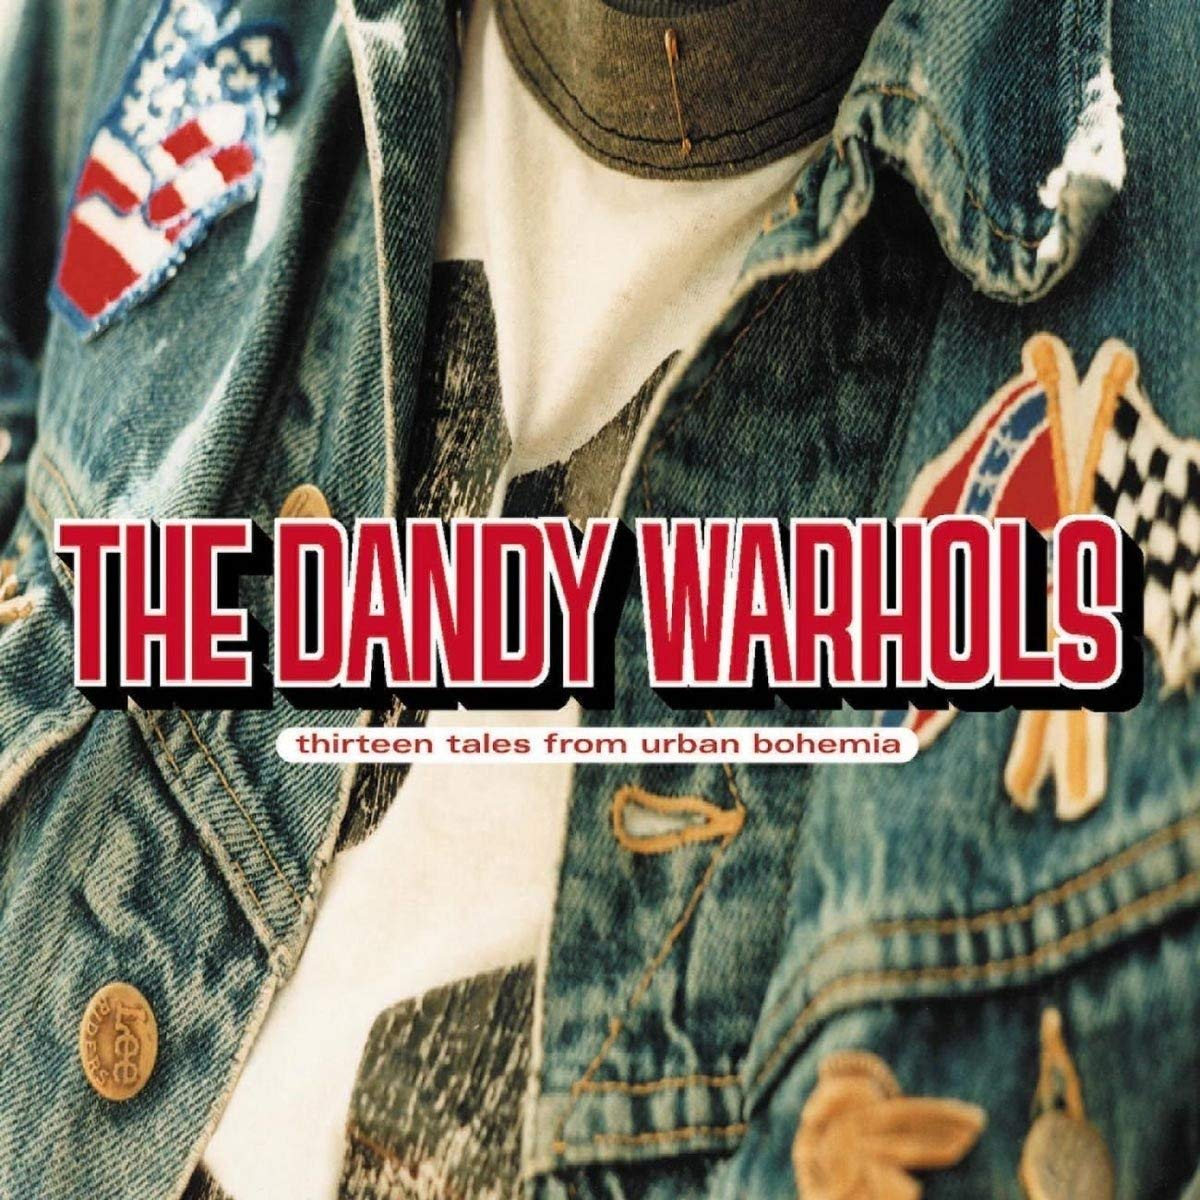 THE DANDY WARHOLS   Thirteen Tales from Urban Bohemia, 2000, Courtney Taylor-Taylor & Dave Sardy & Gregg Williams, 56:07